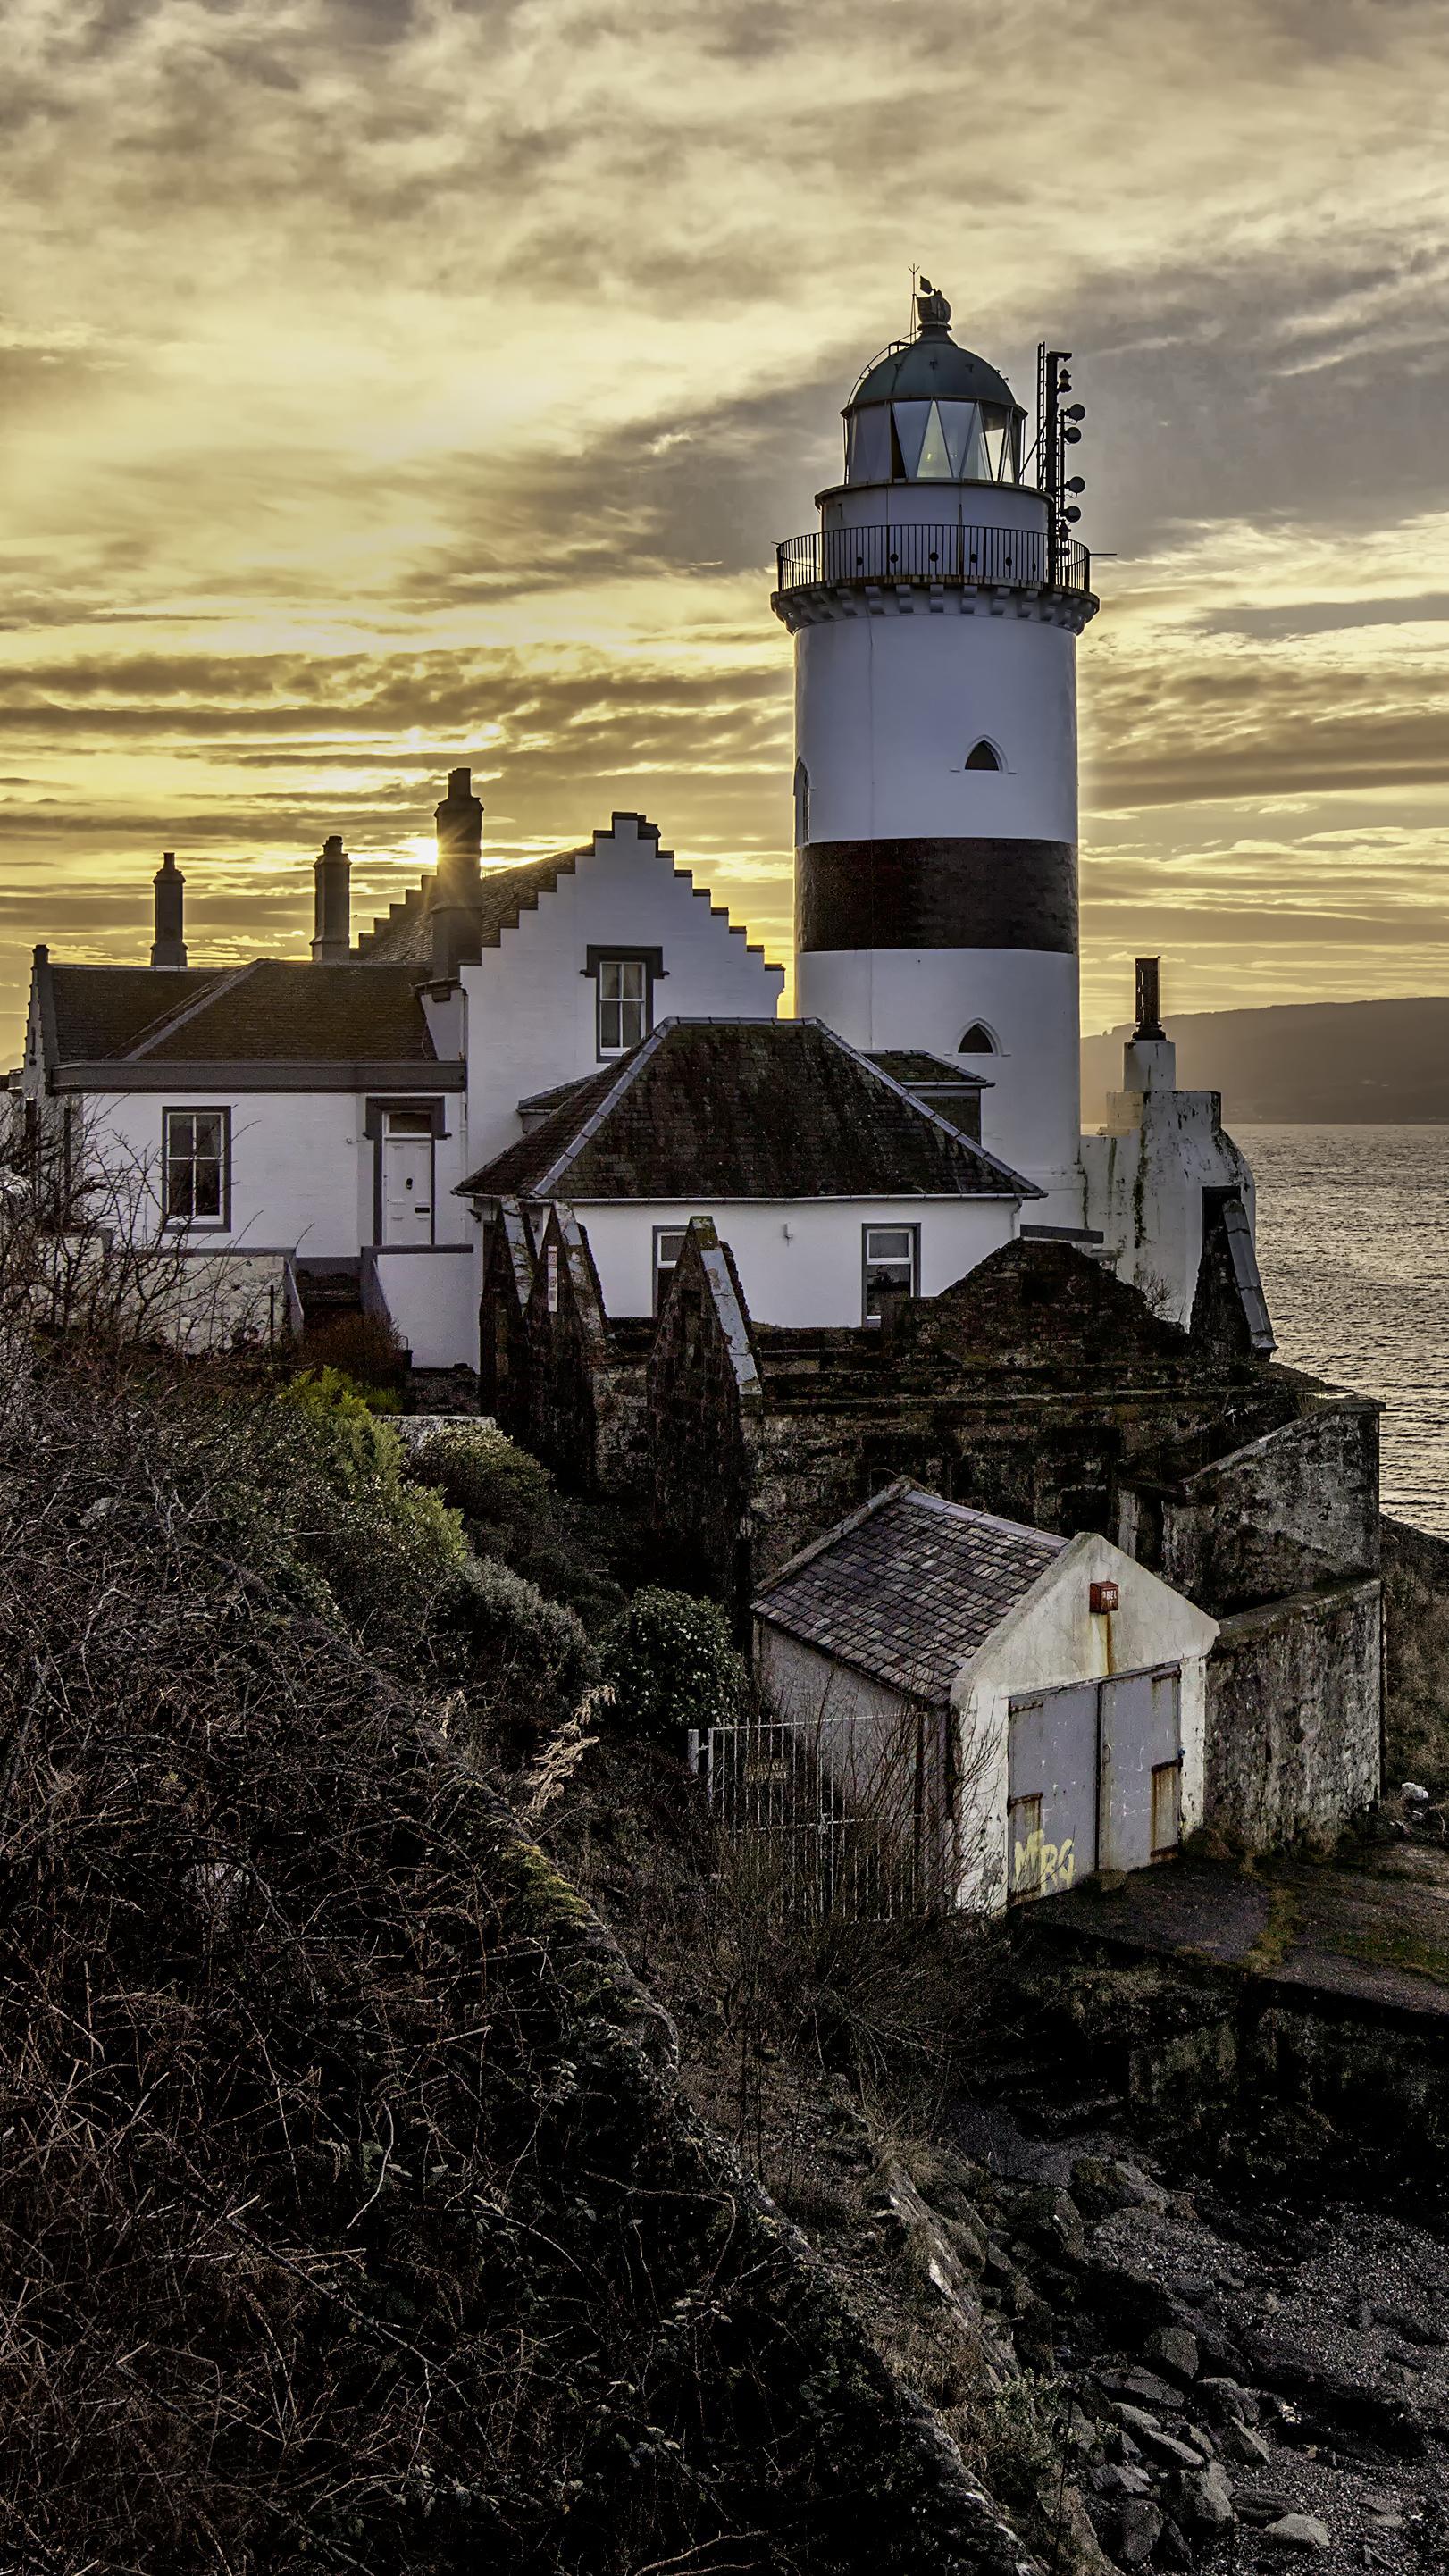 Cloch Lighthouse photo